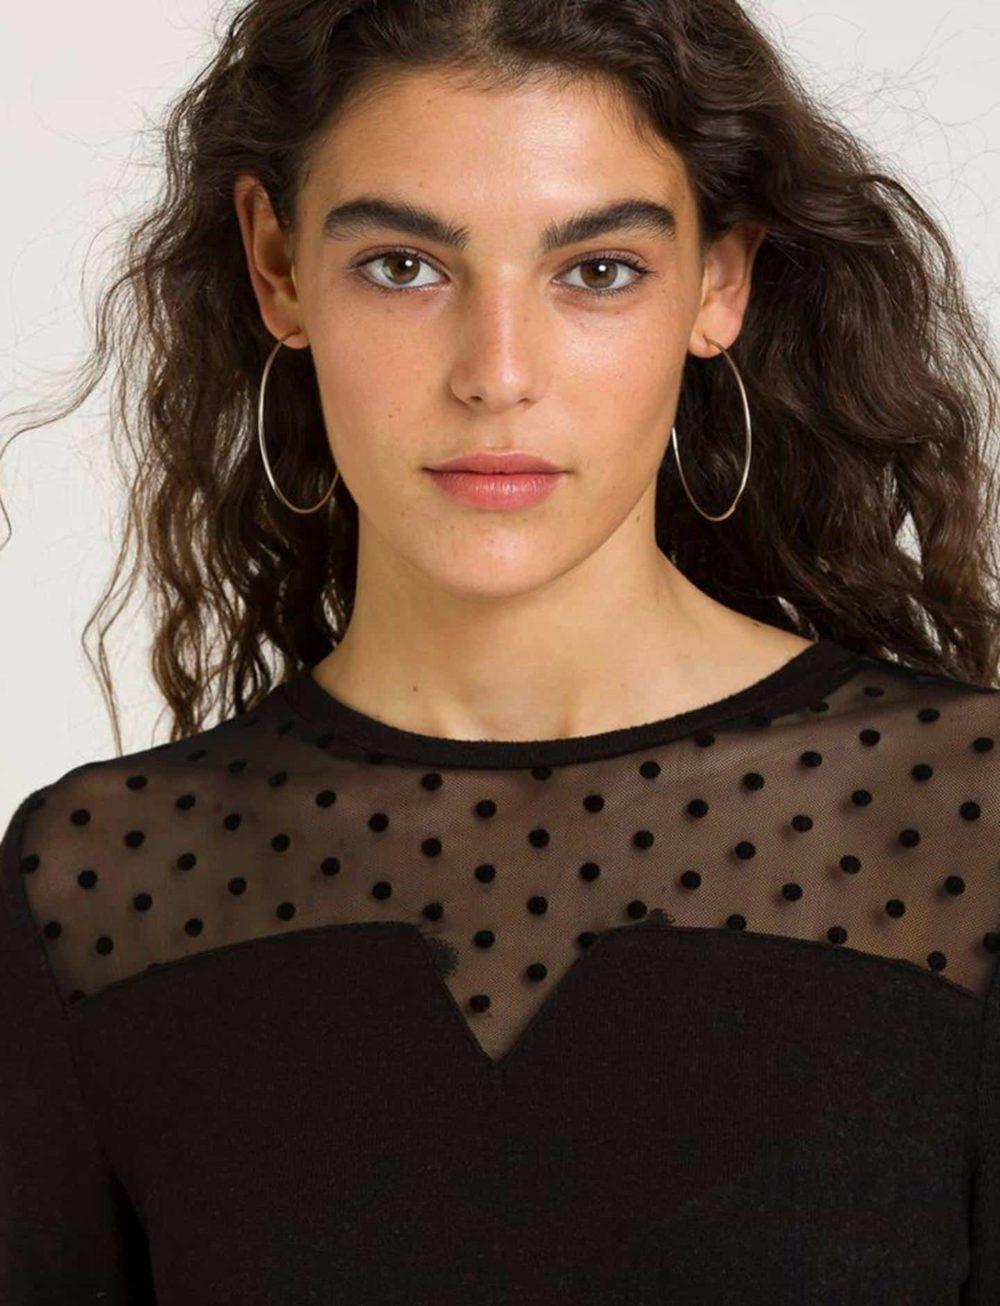 camiseta-combinada-transparencias-negra-detalle